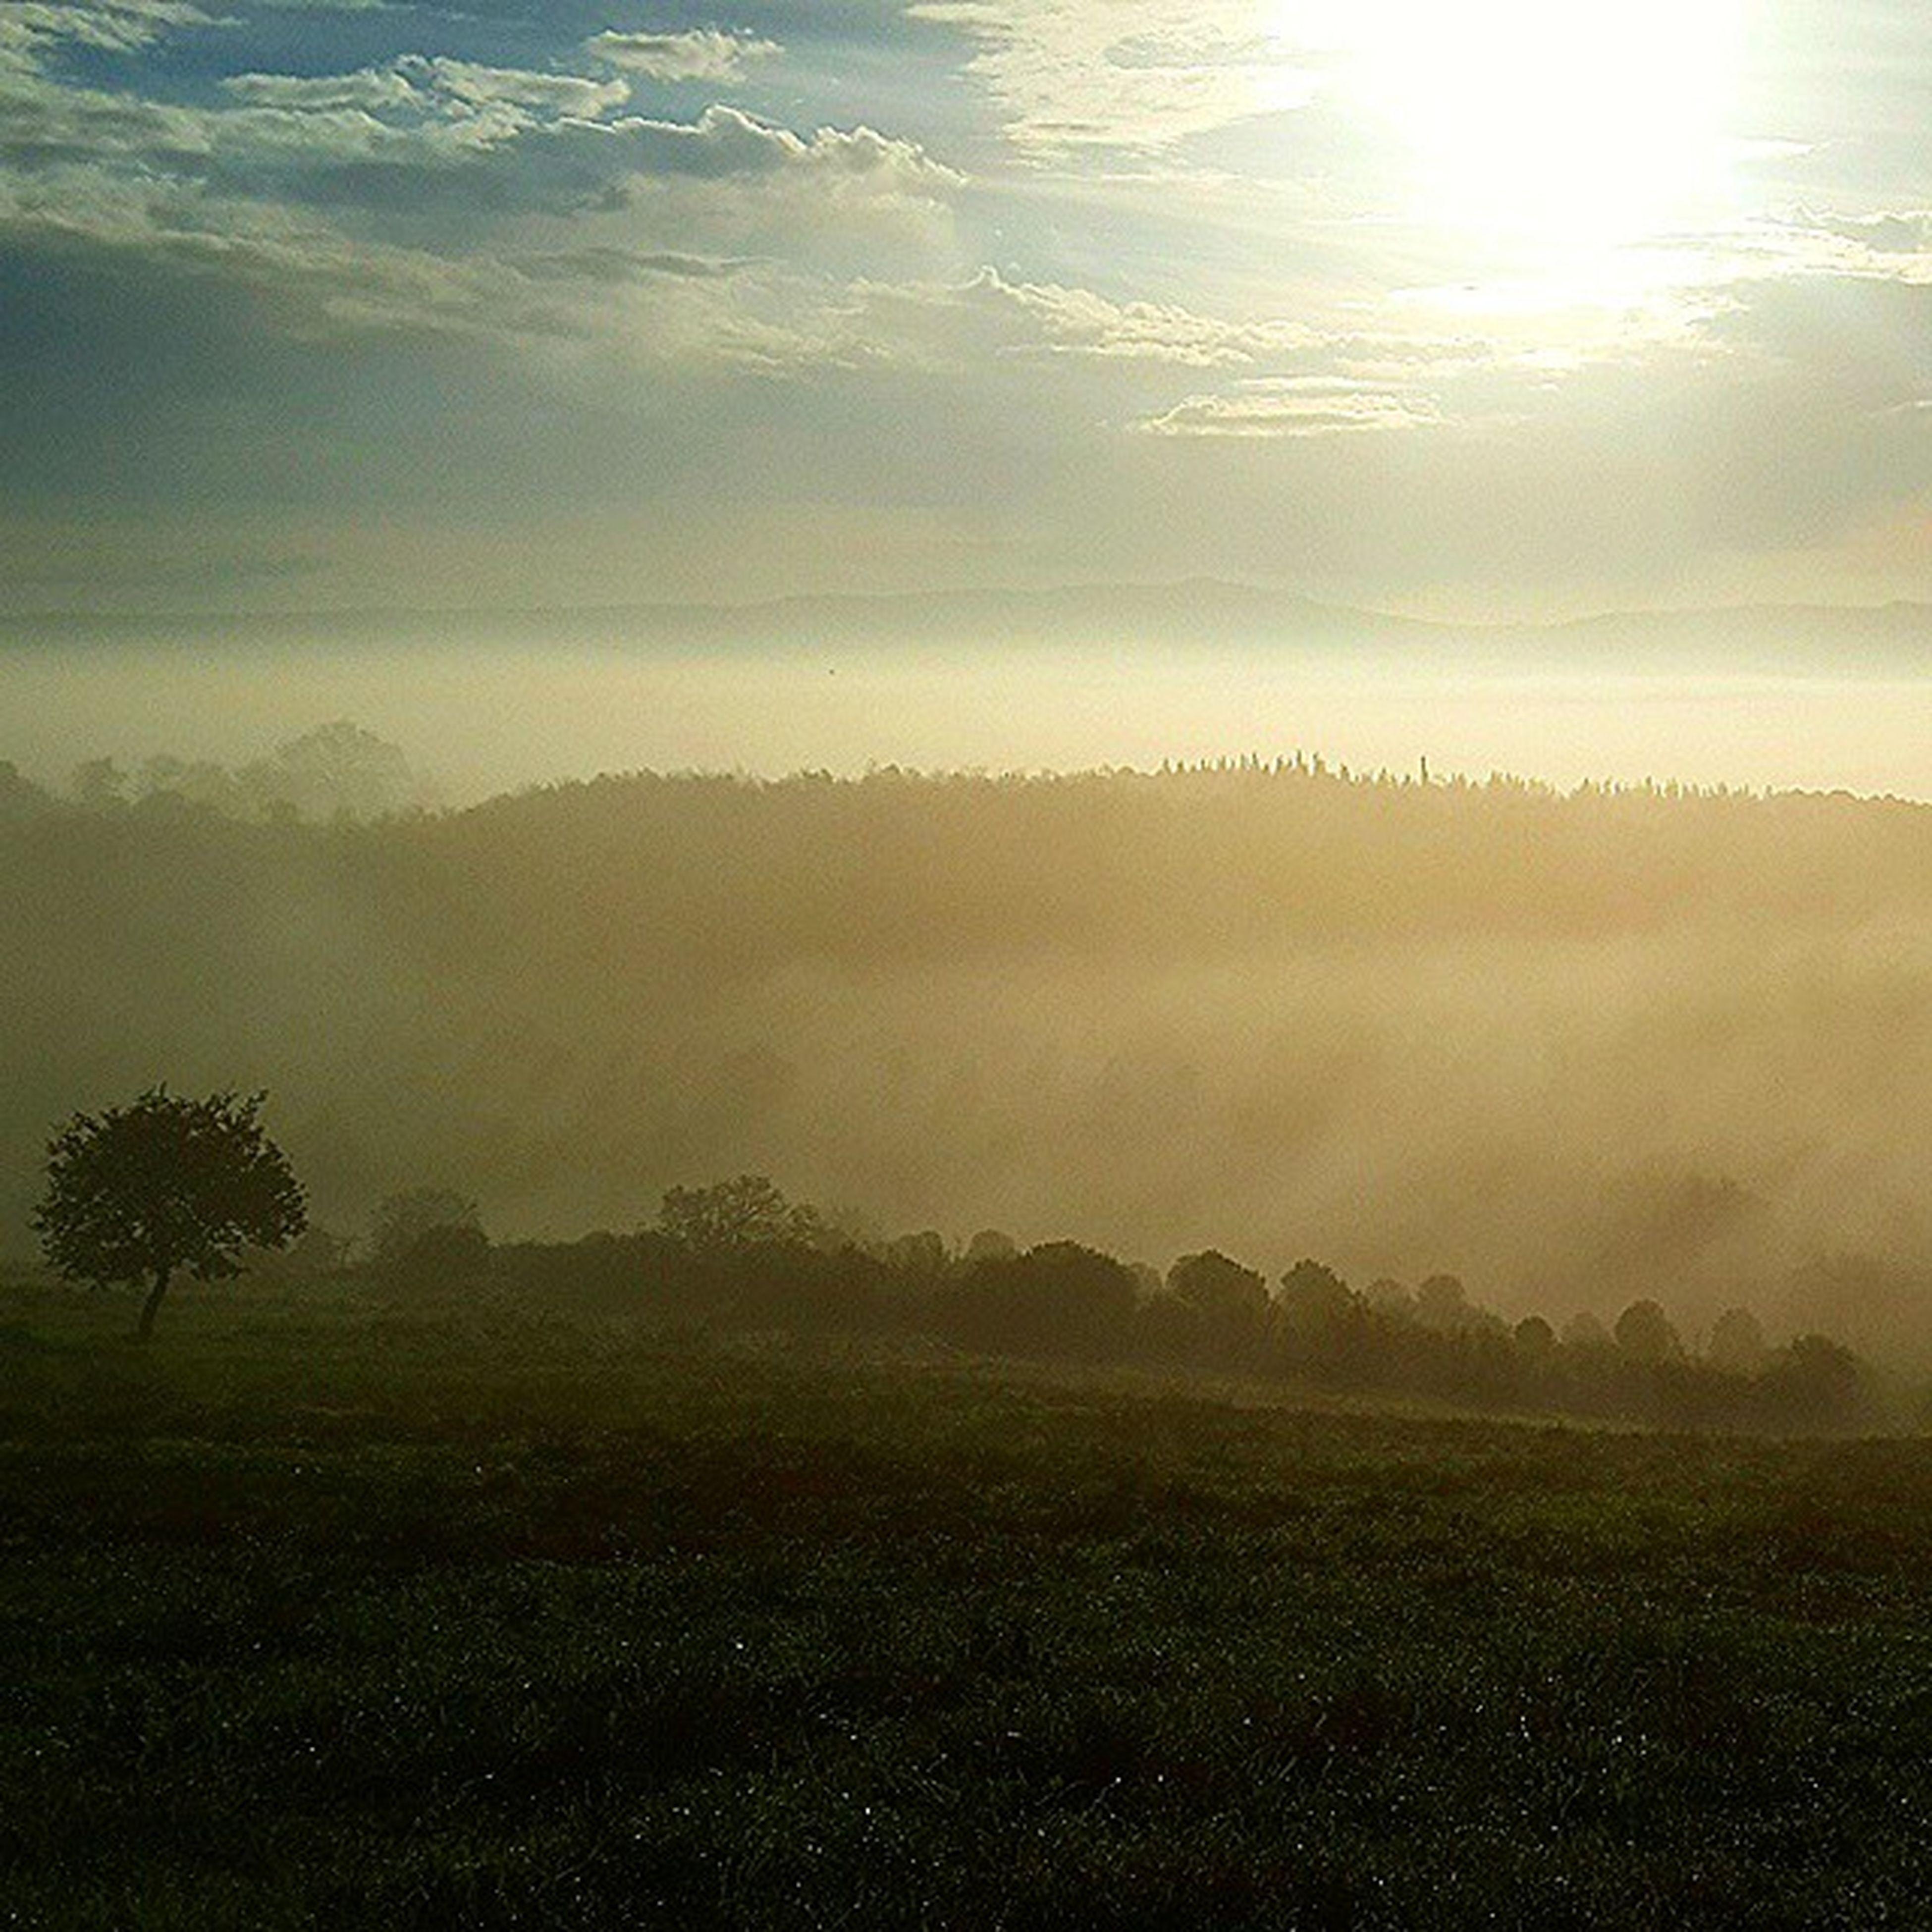 sun, tranquil scene, tranquility, scenics, sunbeam, beauty in nature, sunlight, landscape, nature, lens flare, sky, idyllic, grass, sunset, water, non-urban scene, field, tree, outdoors, remote